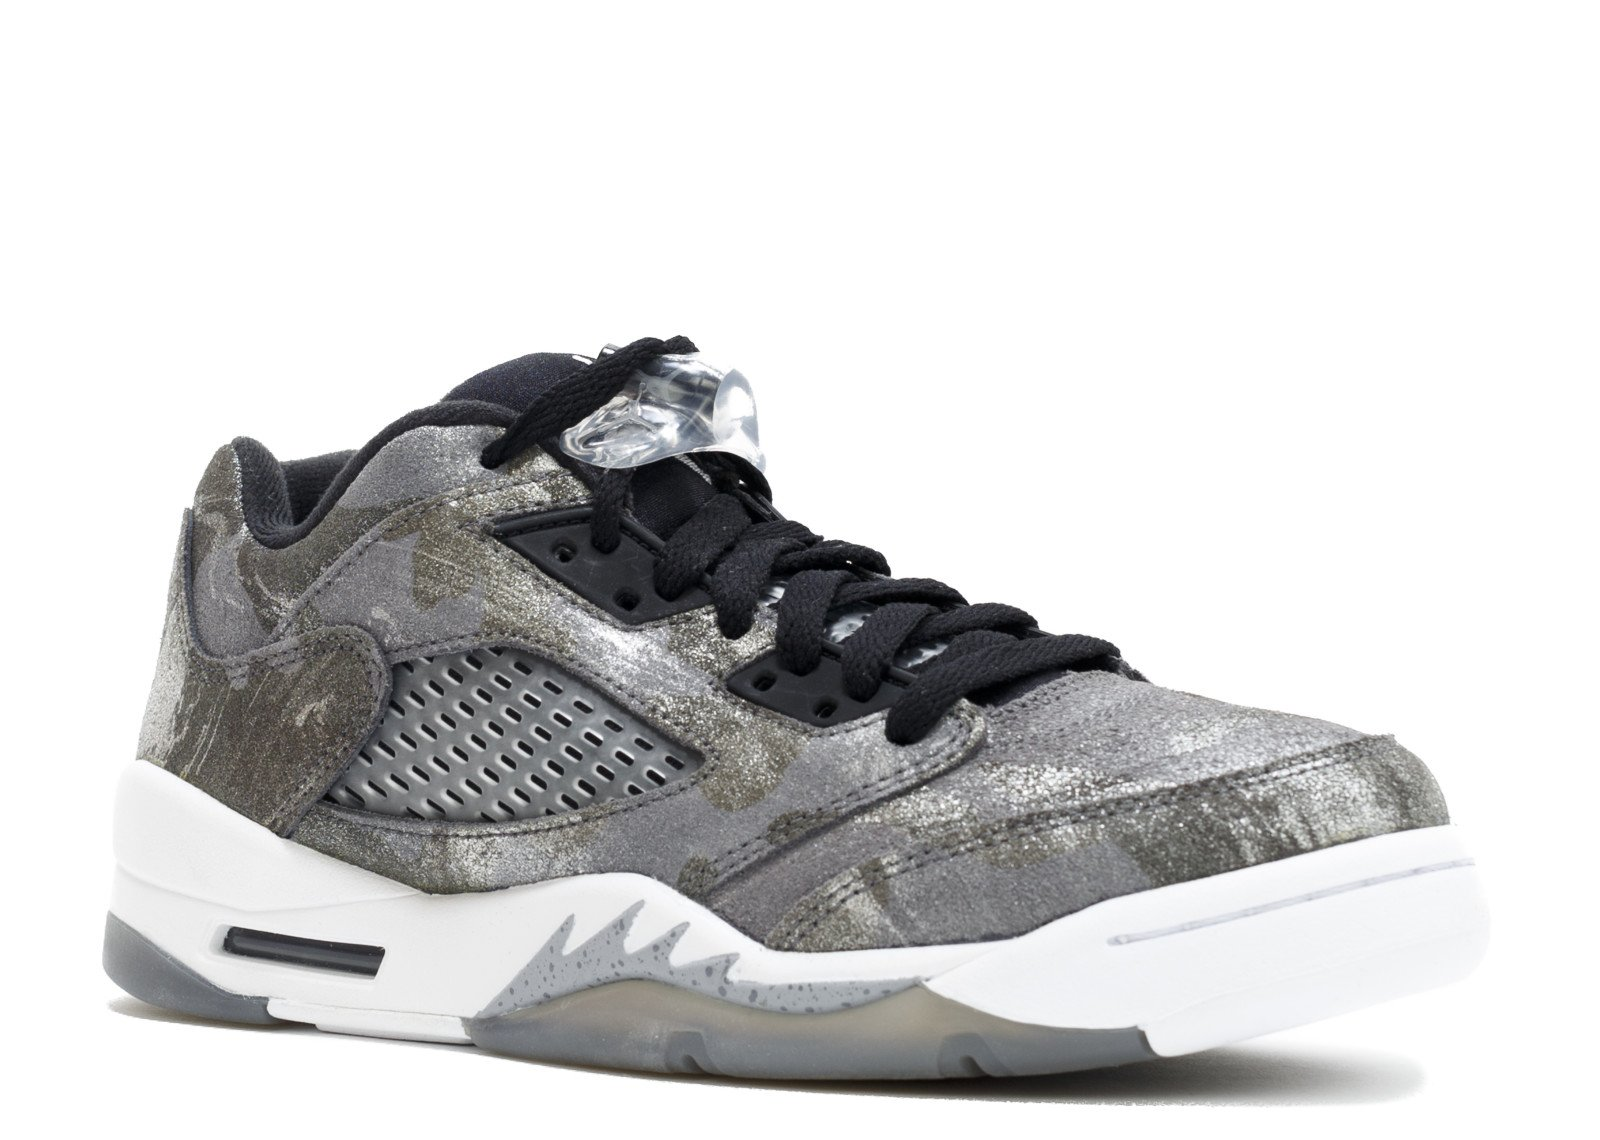 Nike Air Jordan 5 Retro Prem Low GG Grey/Black 819951-003 (SIZE: 8.5Y)